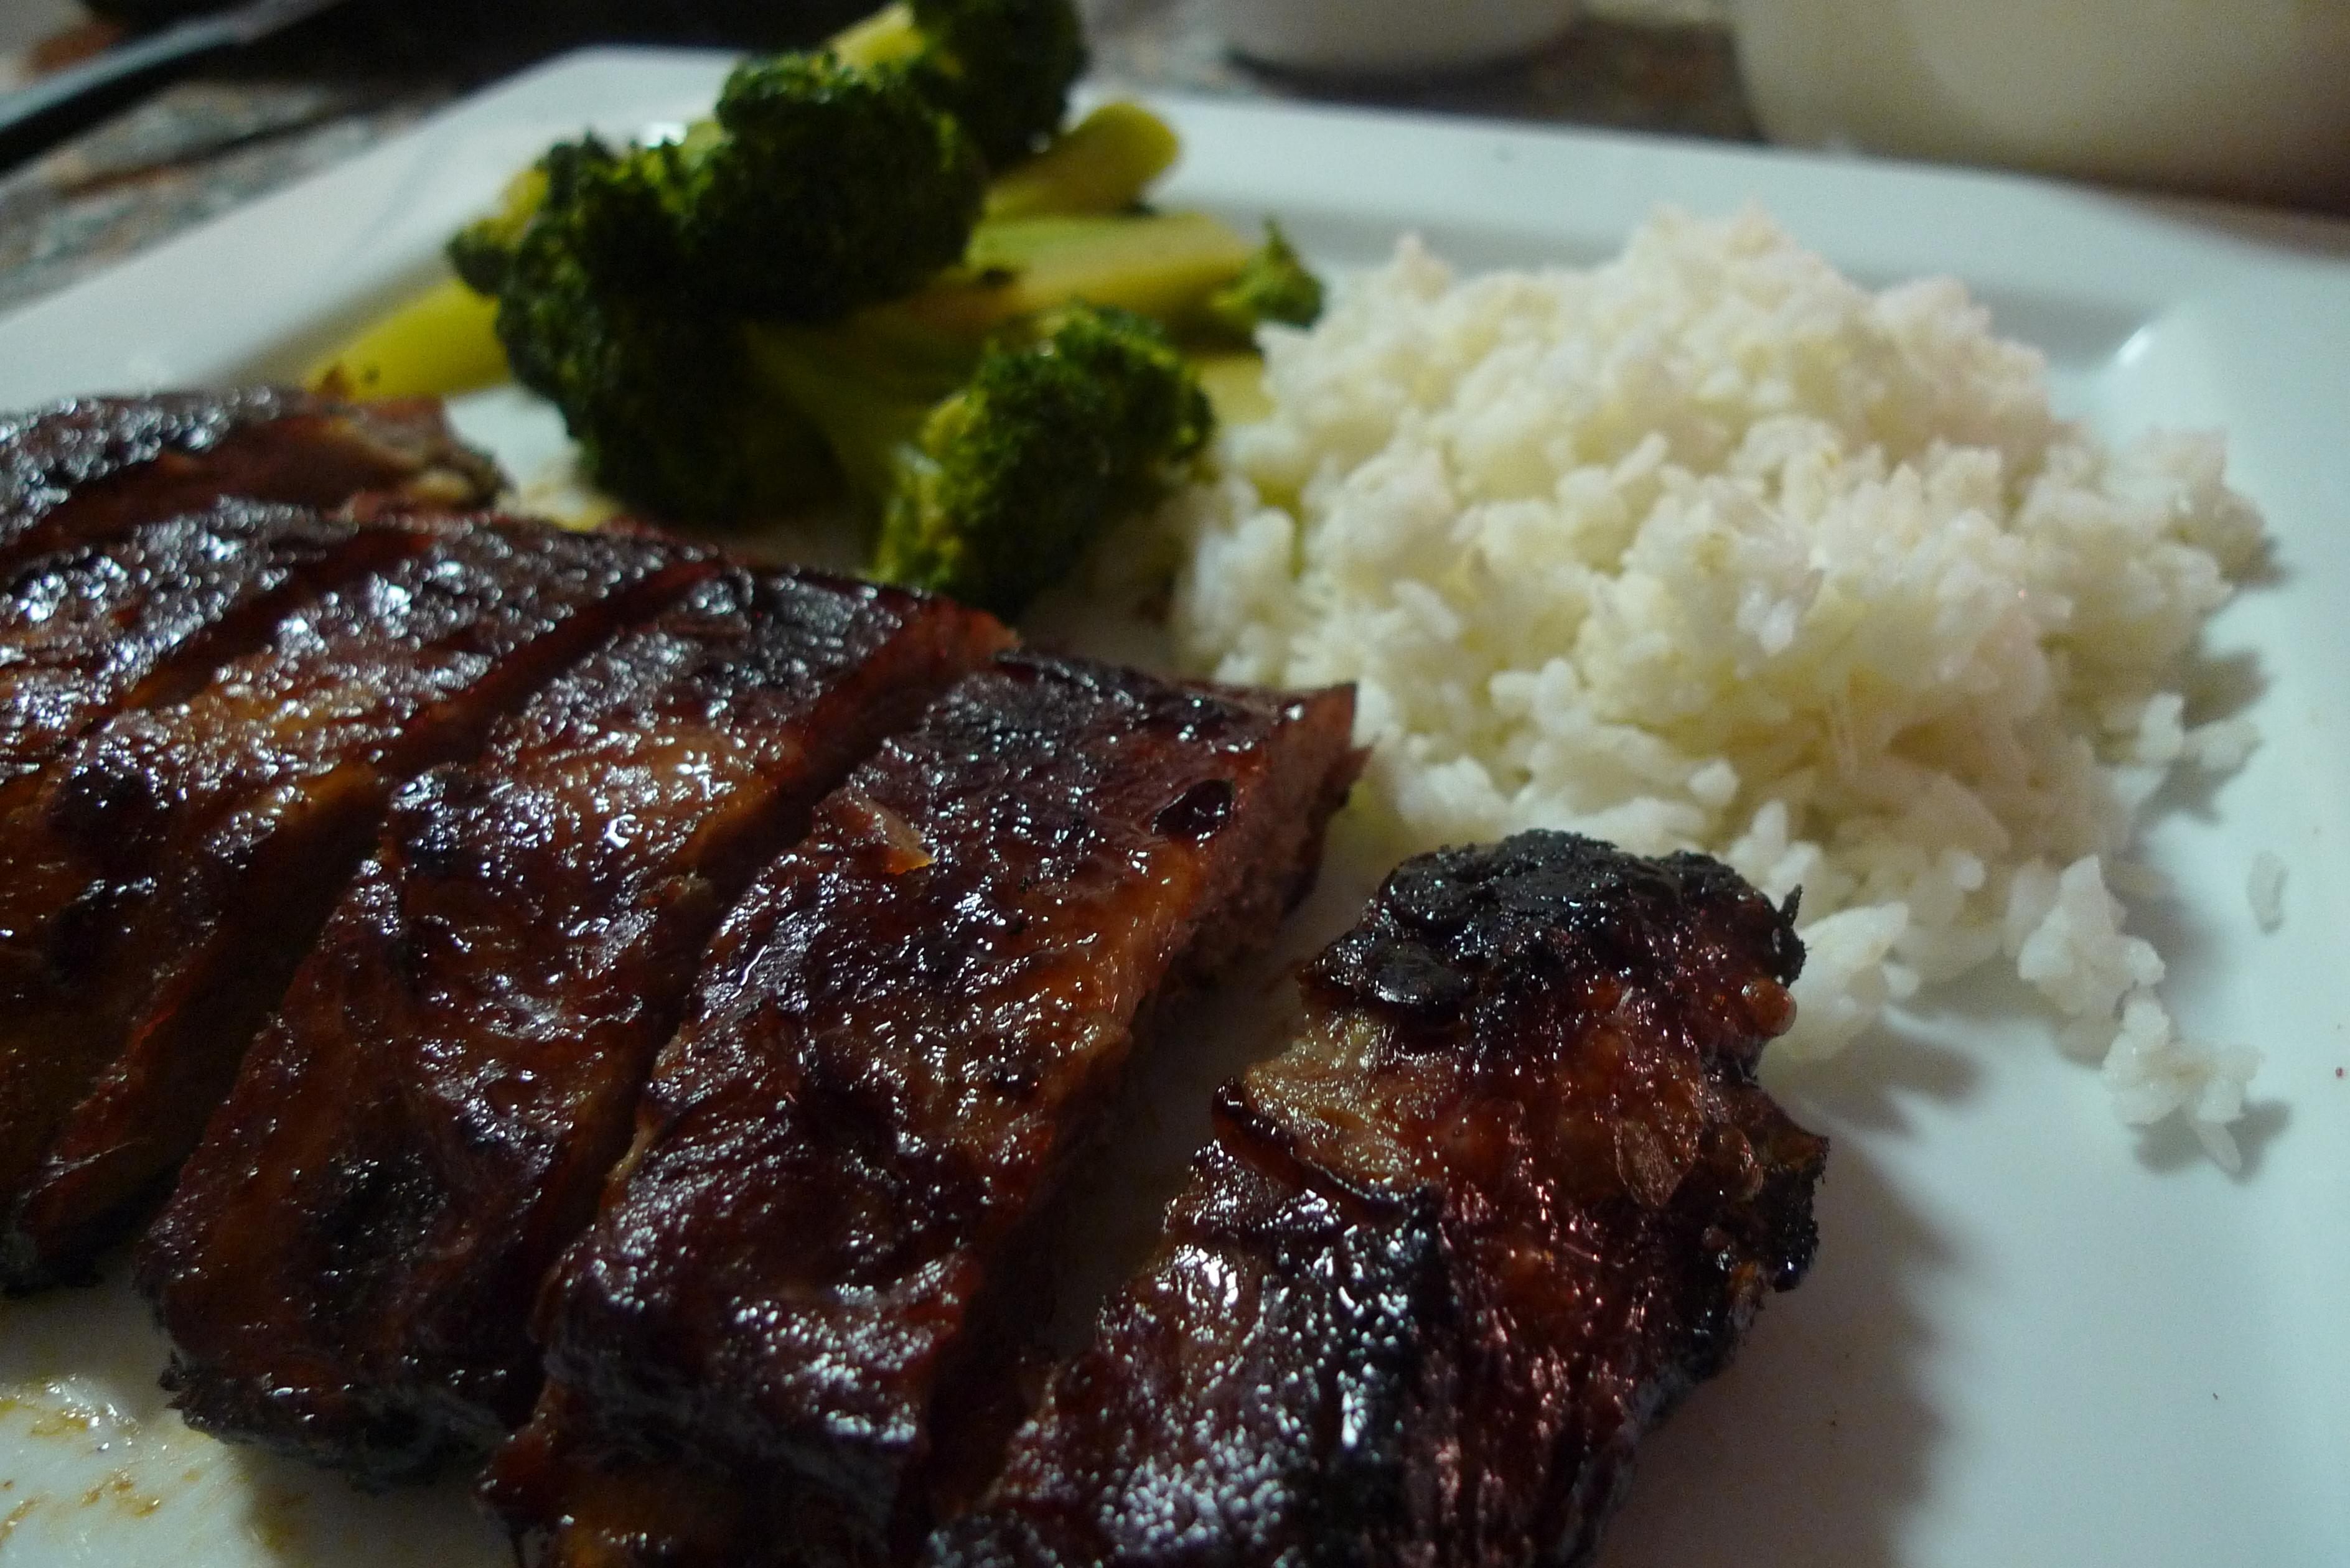 char siu baby back ribs with broccoli and rice